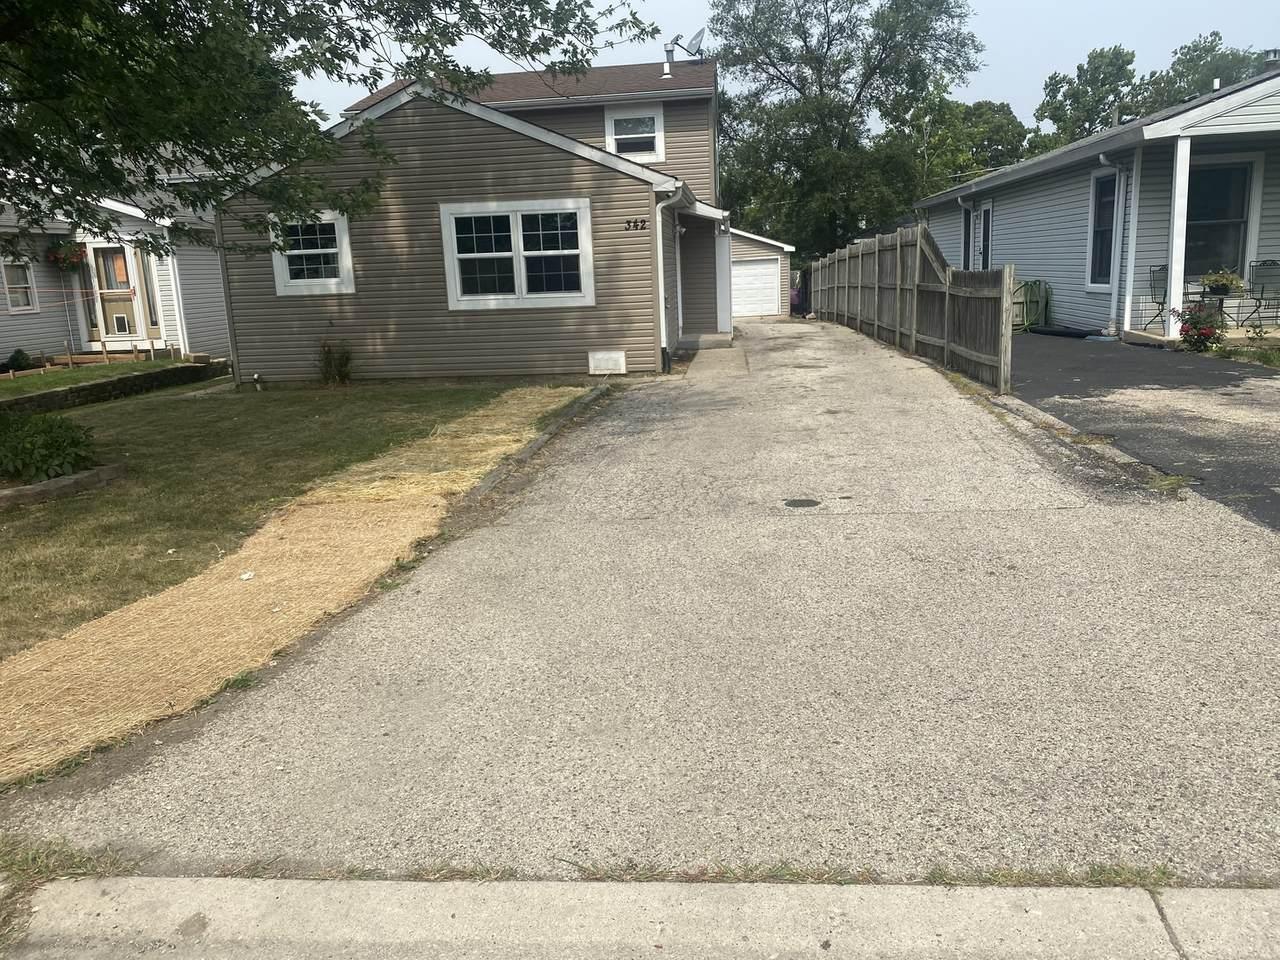 342 Lawn Terrace - Photo 1